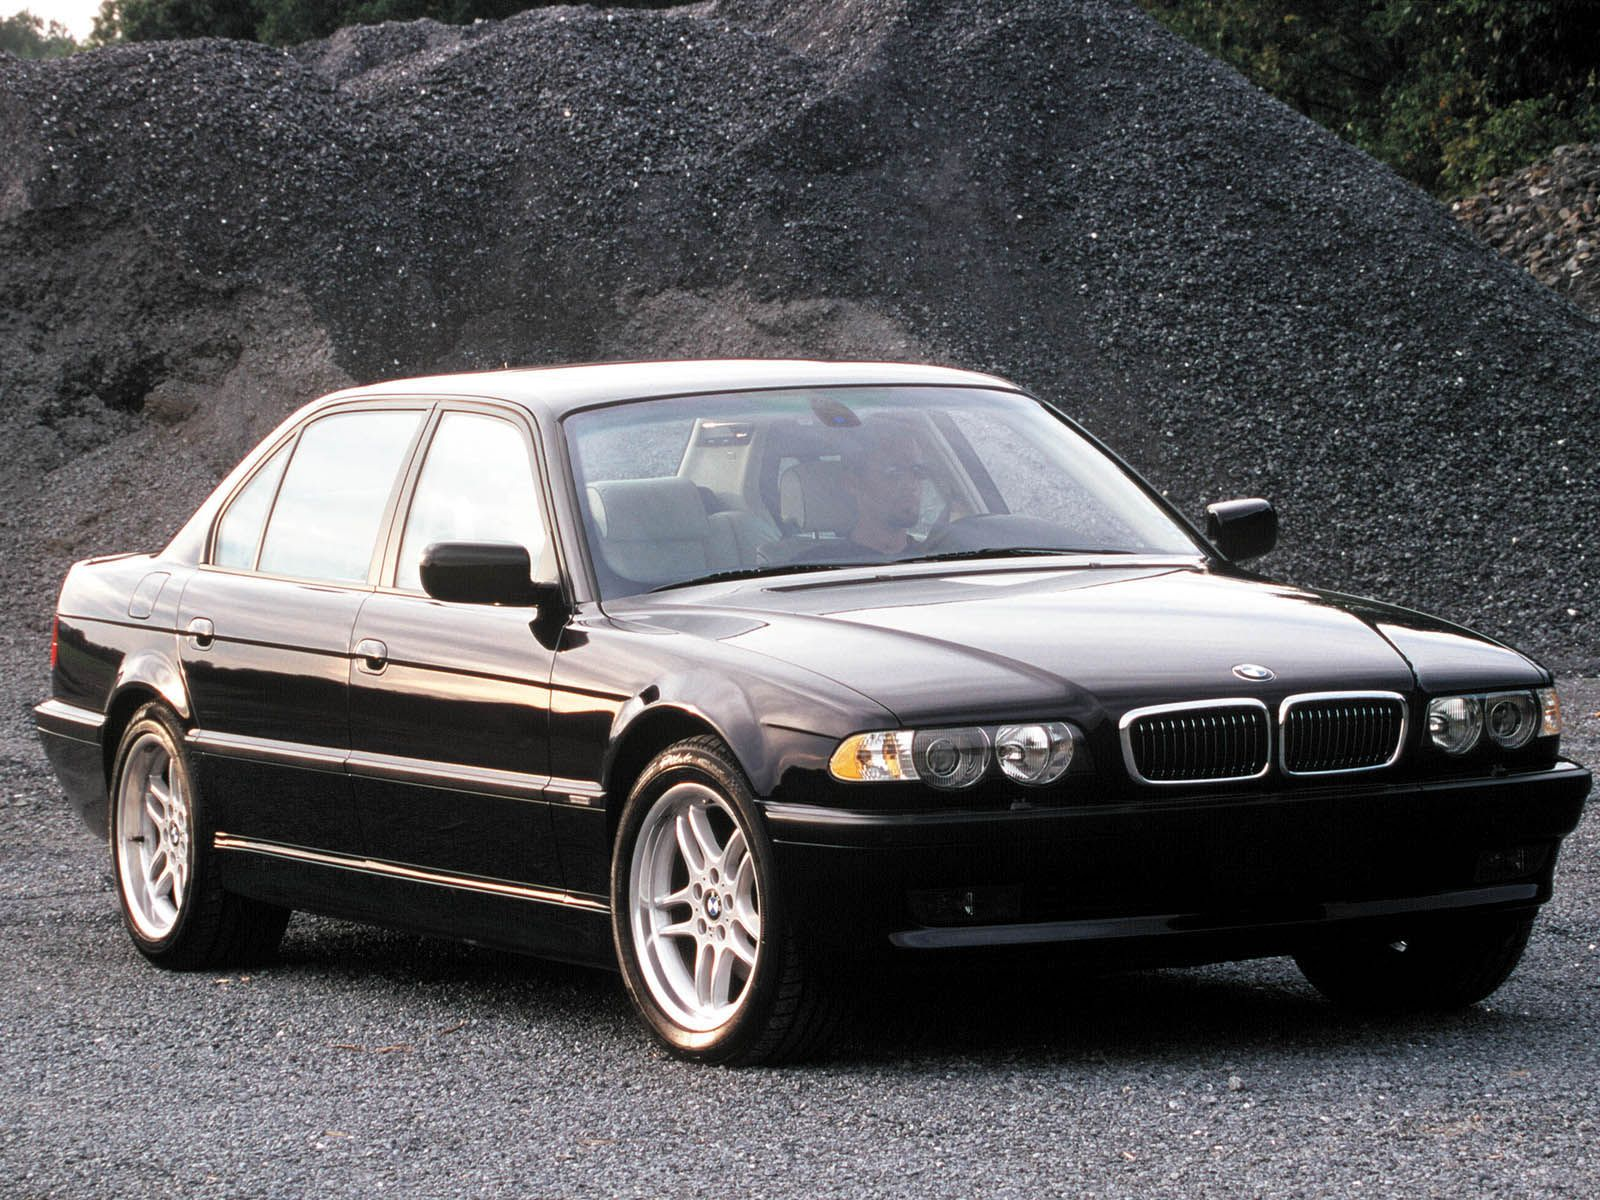 Worksheet. 2002 BMW 7 Series  2002 BMW 7 Series For Sale Carsforsalecom